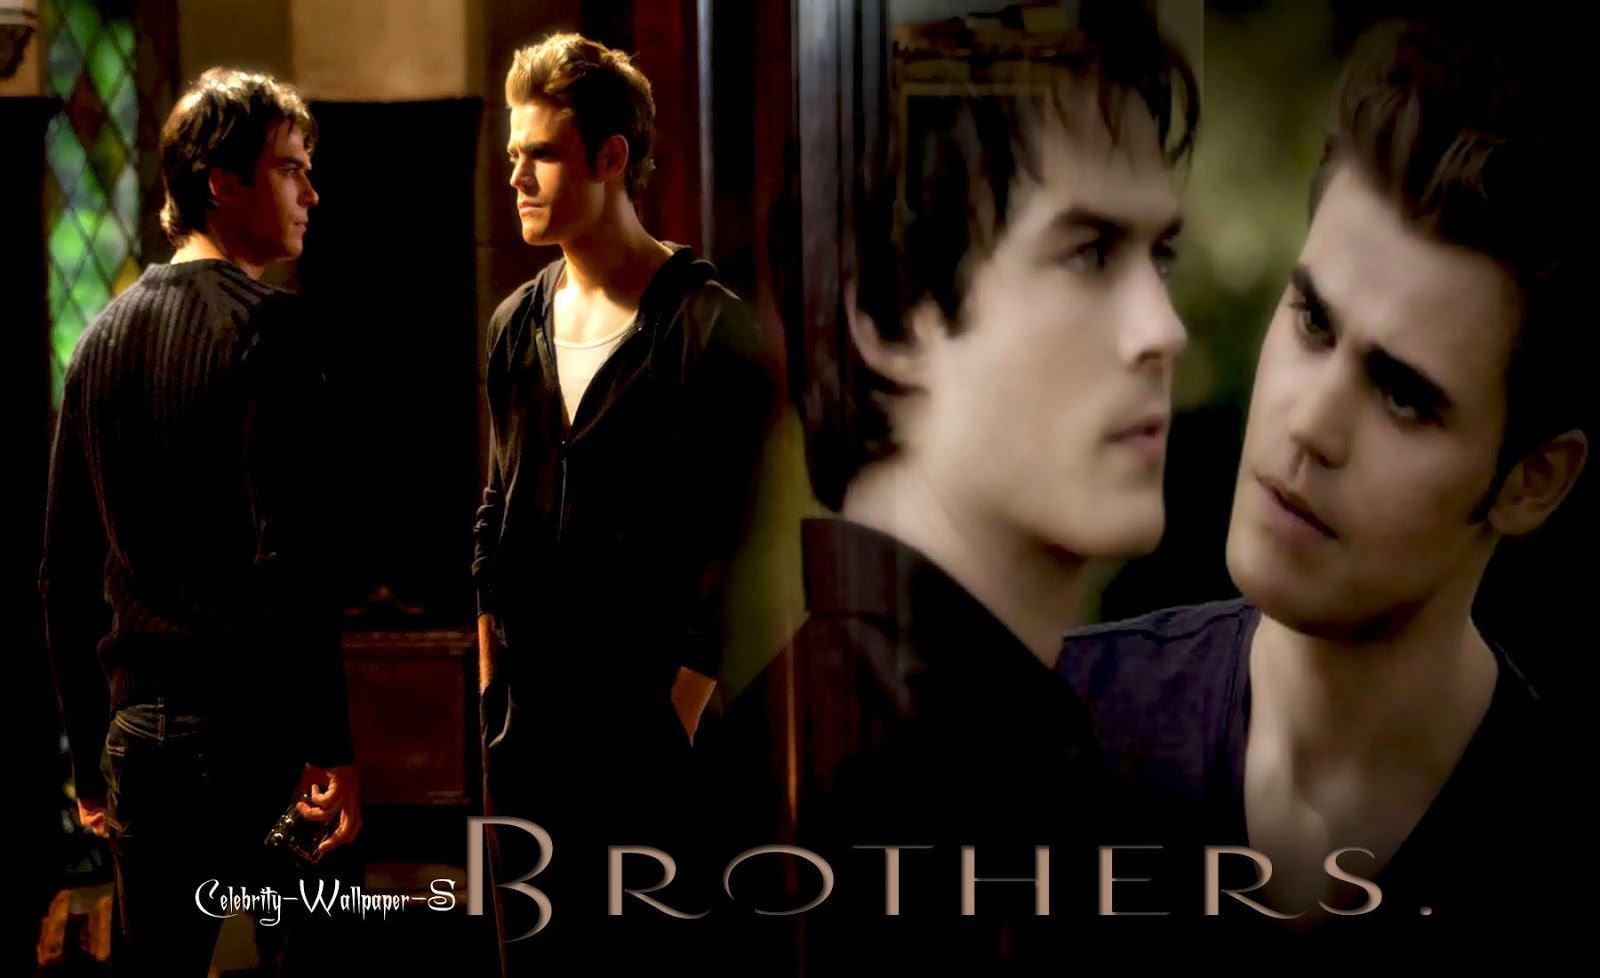 Stefan Damon The Vampire Diaries Wallpaper HD